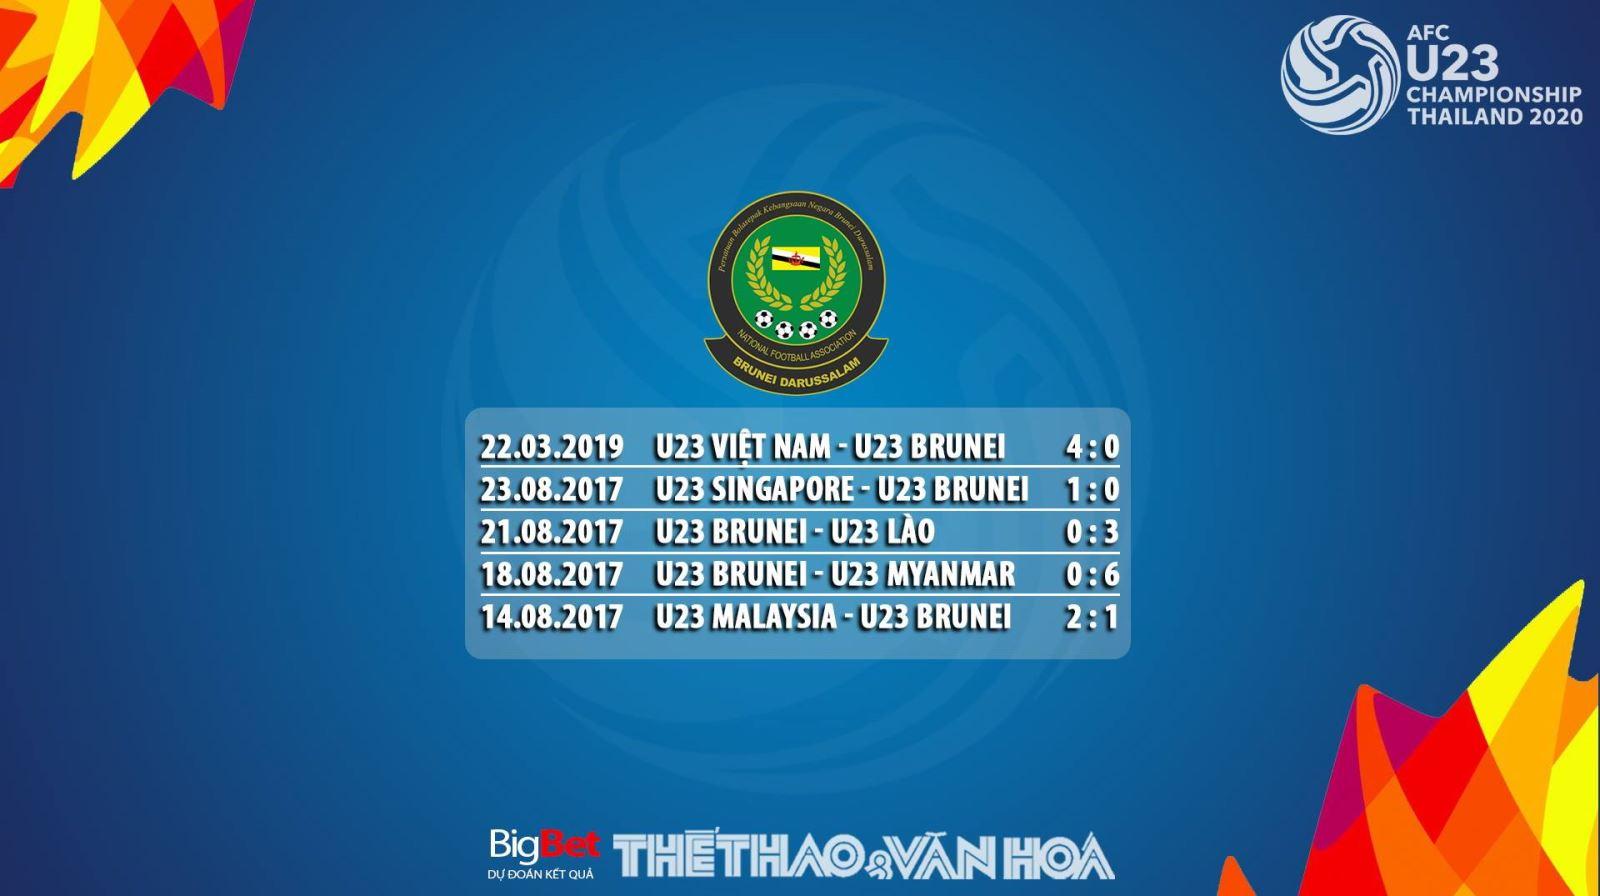 U23 Thái Lan, U23 Brunei, U23 Thái Lan vs Brunei, U23 Brunei vs Thái Lan, Thái Lan, Brunei, Thái, Bruney